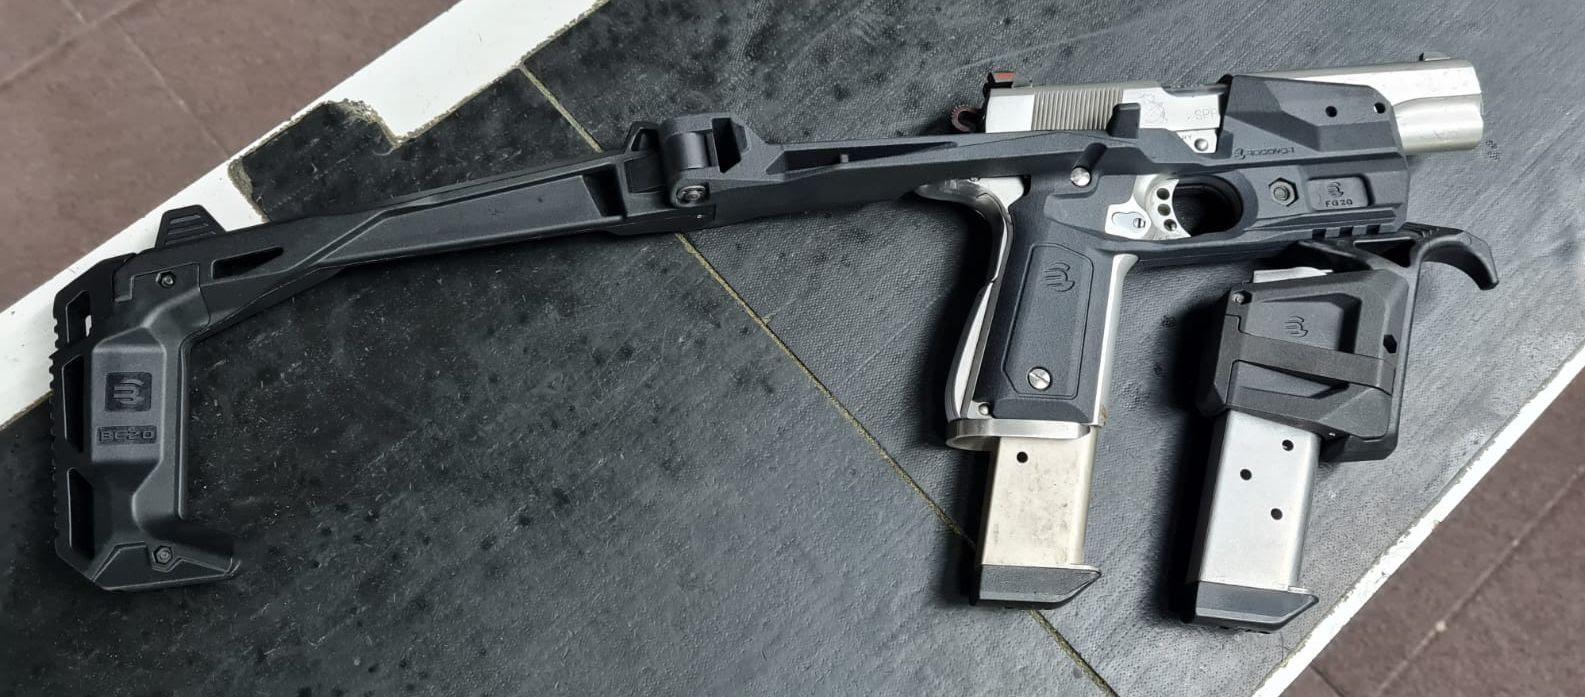 recover tactical 1911 stabilizer pistol brace